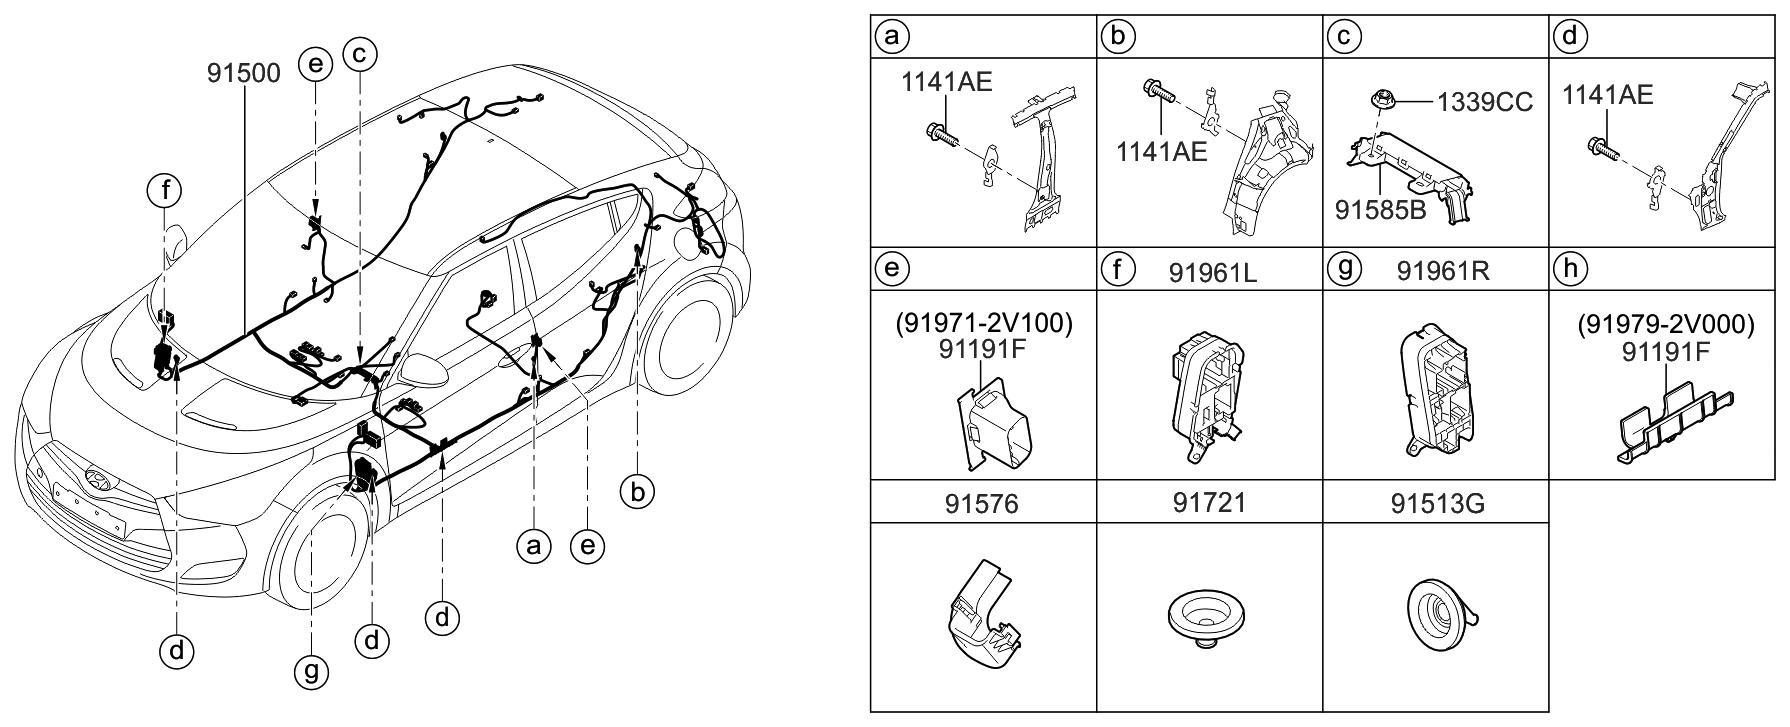 91551 2v470 Genuine Hyundai Wiring Assembly Floor Veloster Diagram 2017